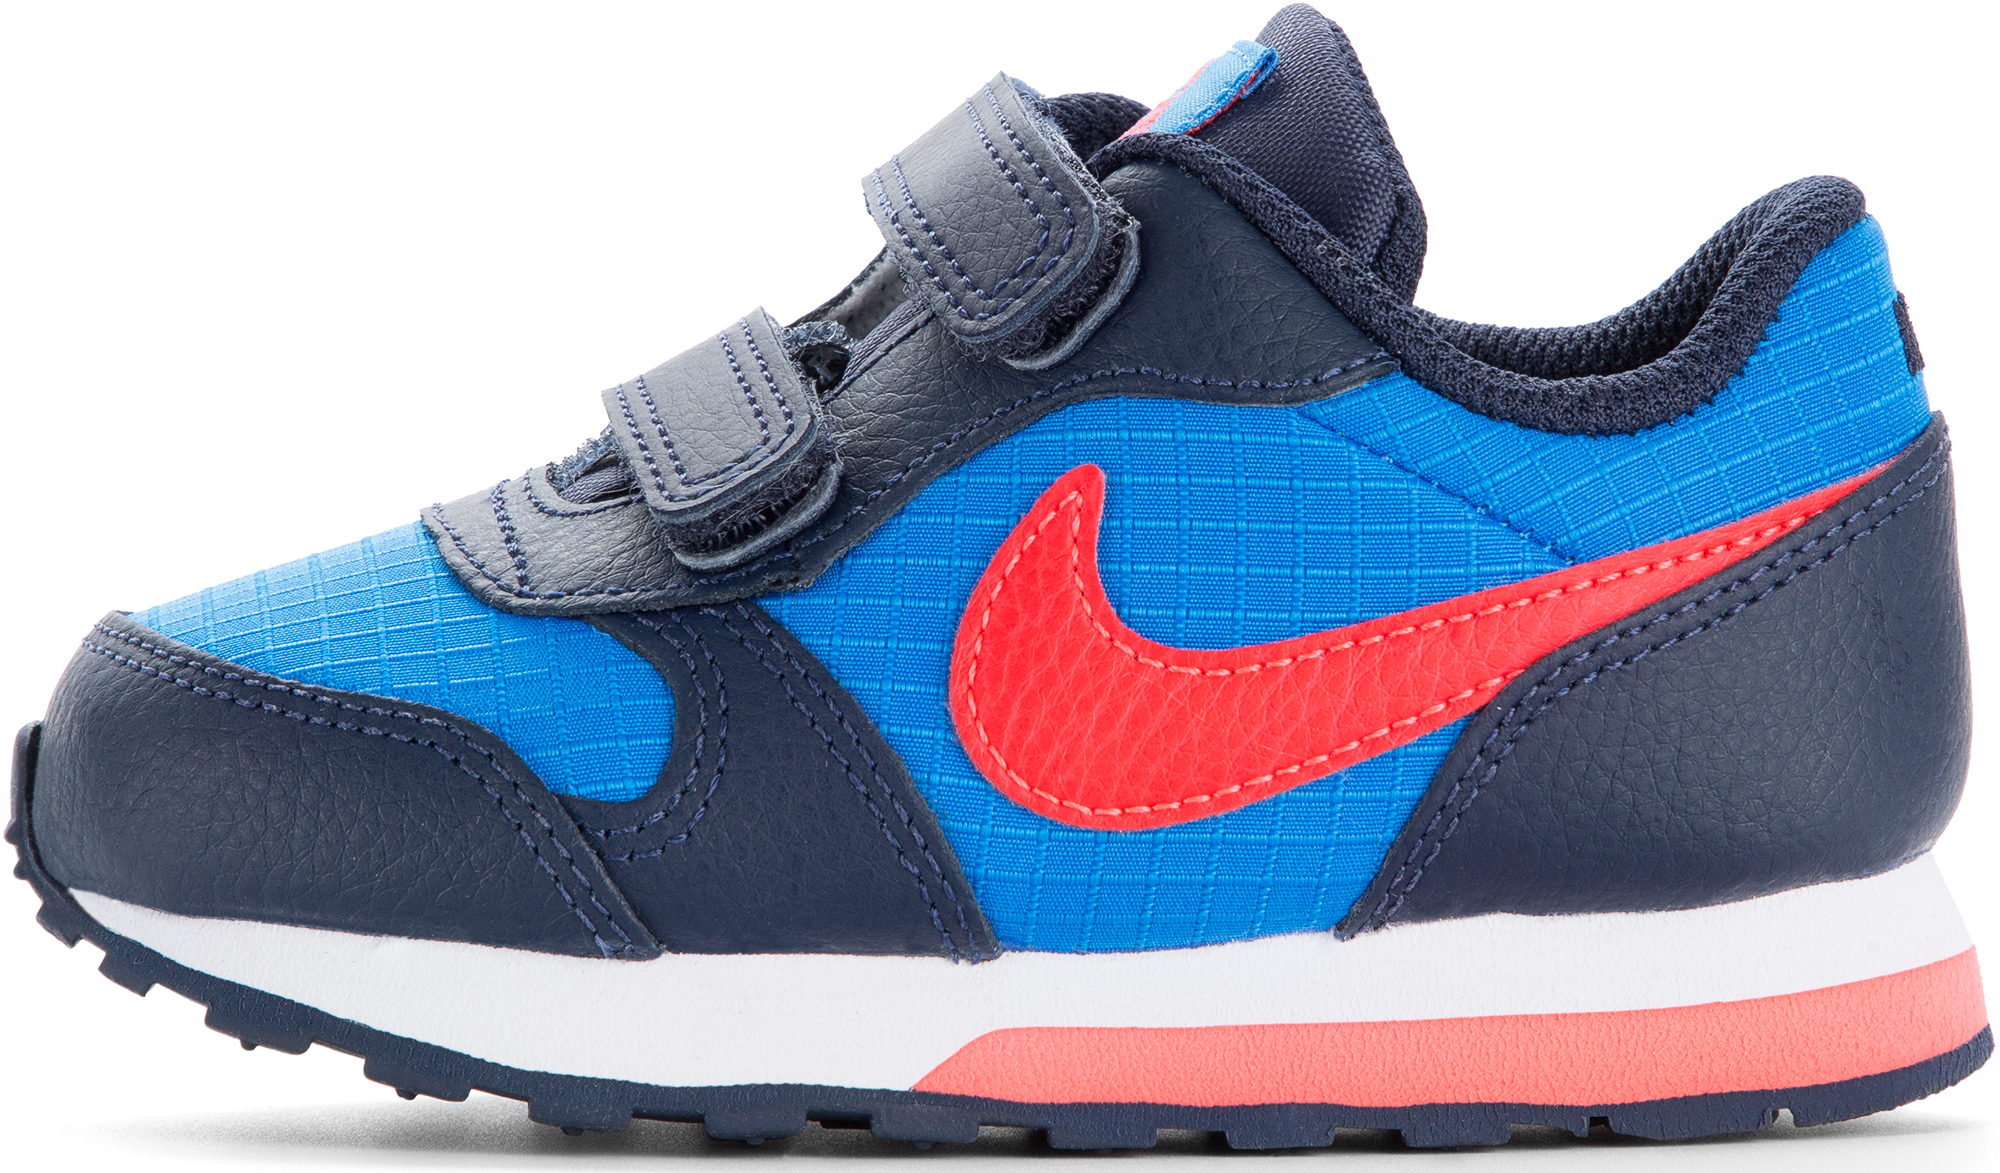 Nike Кроссовки для мальчиков Nike MD Runner 2, размер 26